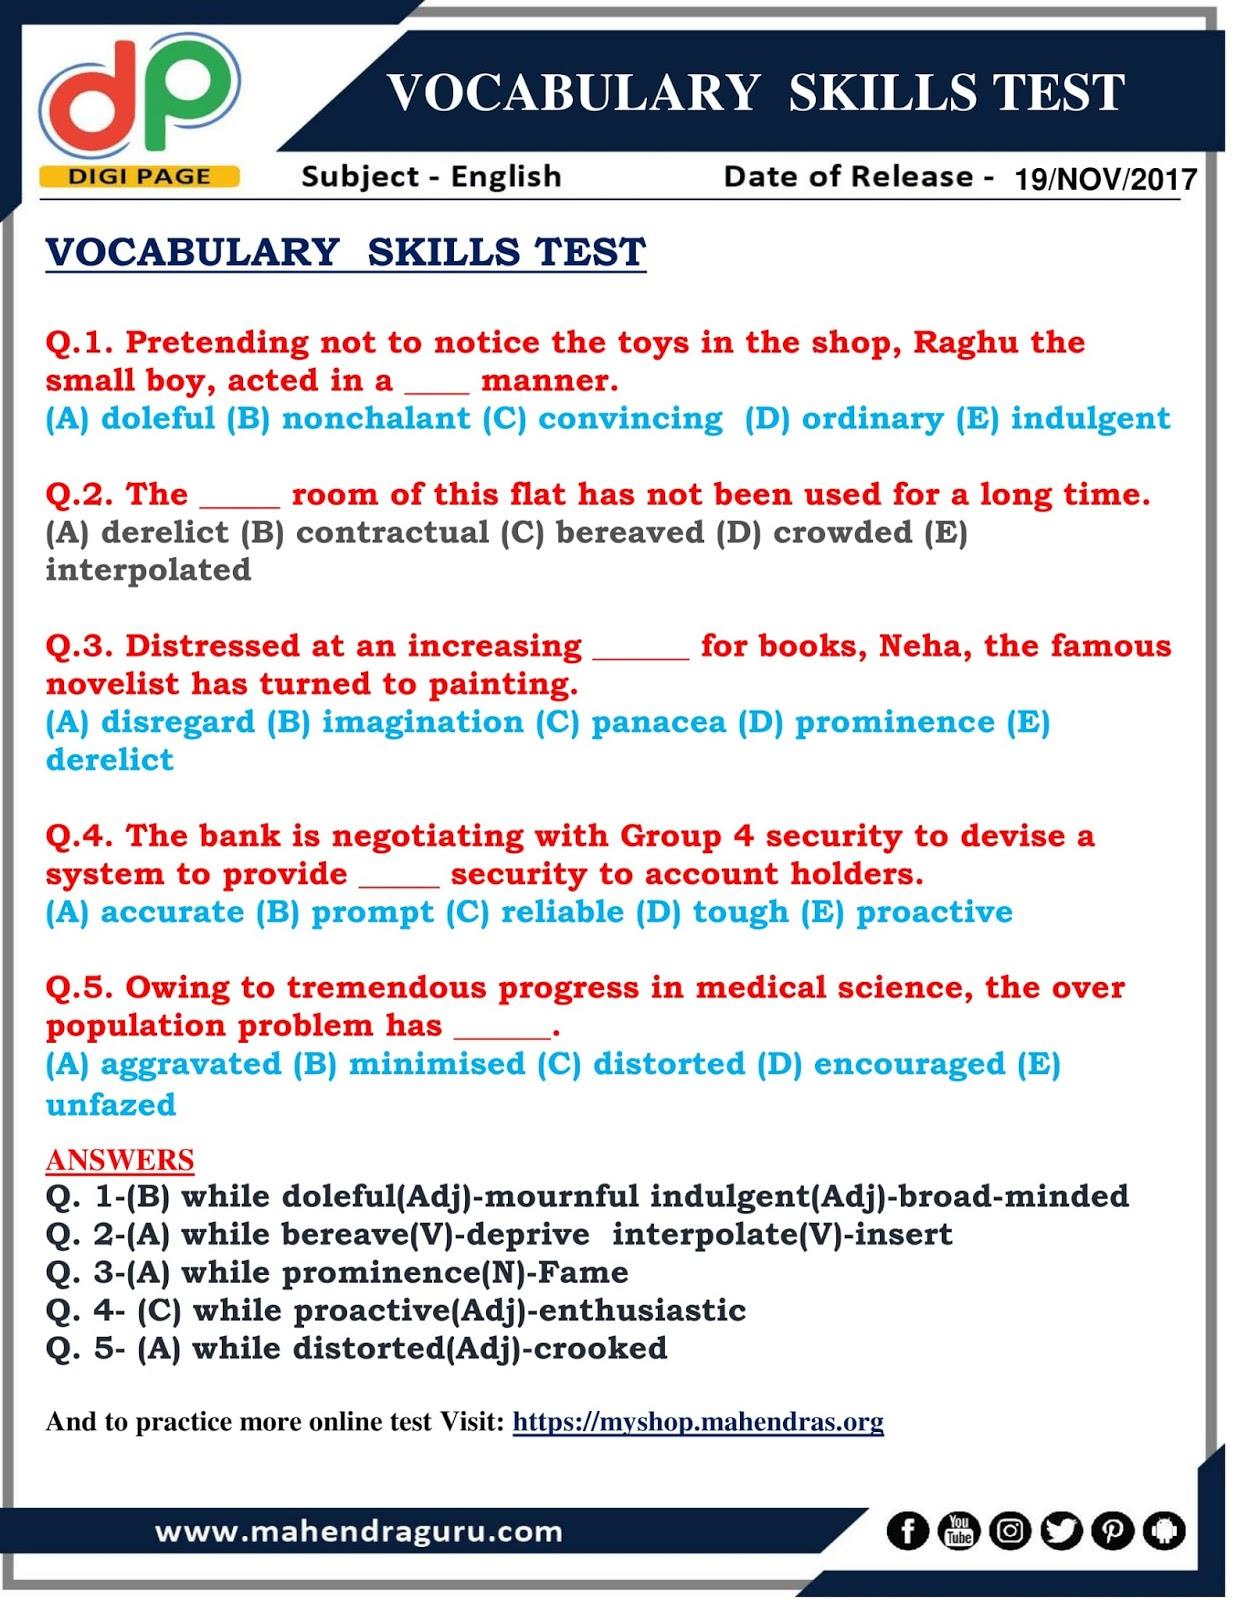 Dp Vocabulary Skills Test 19